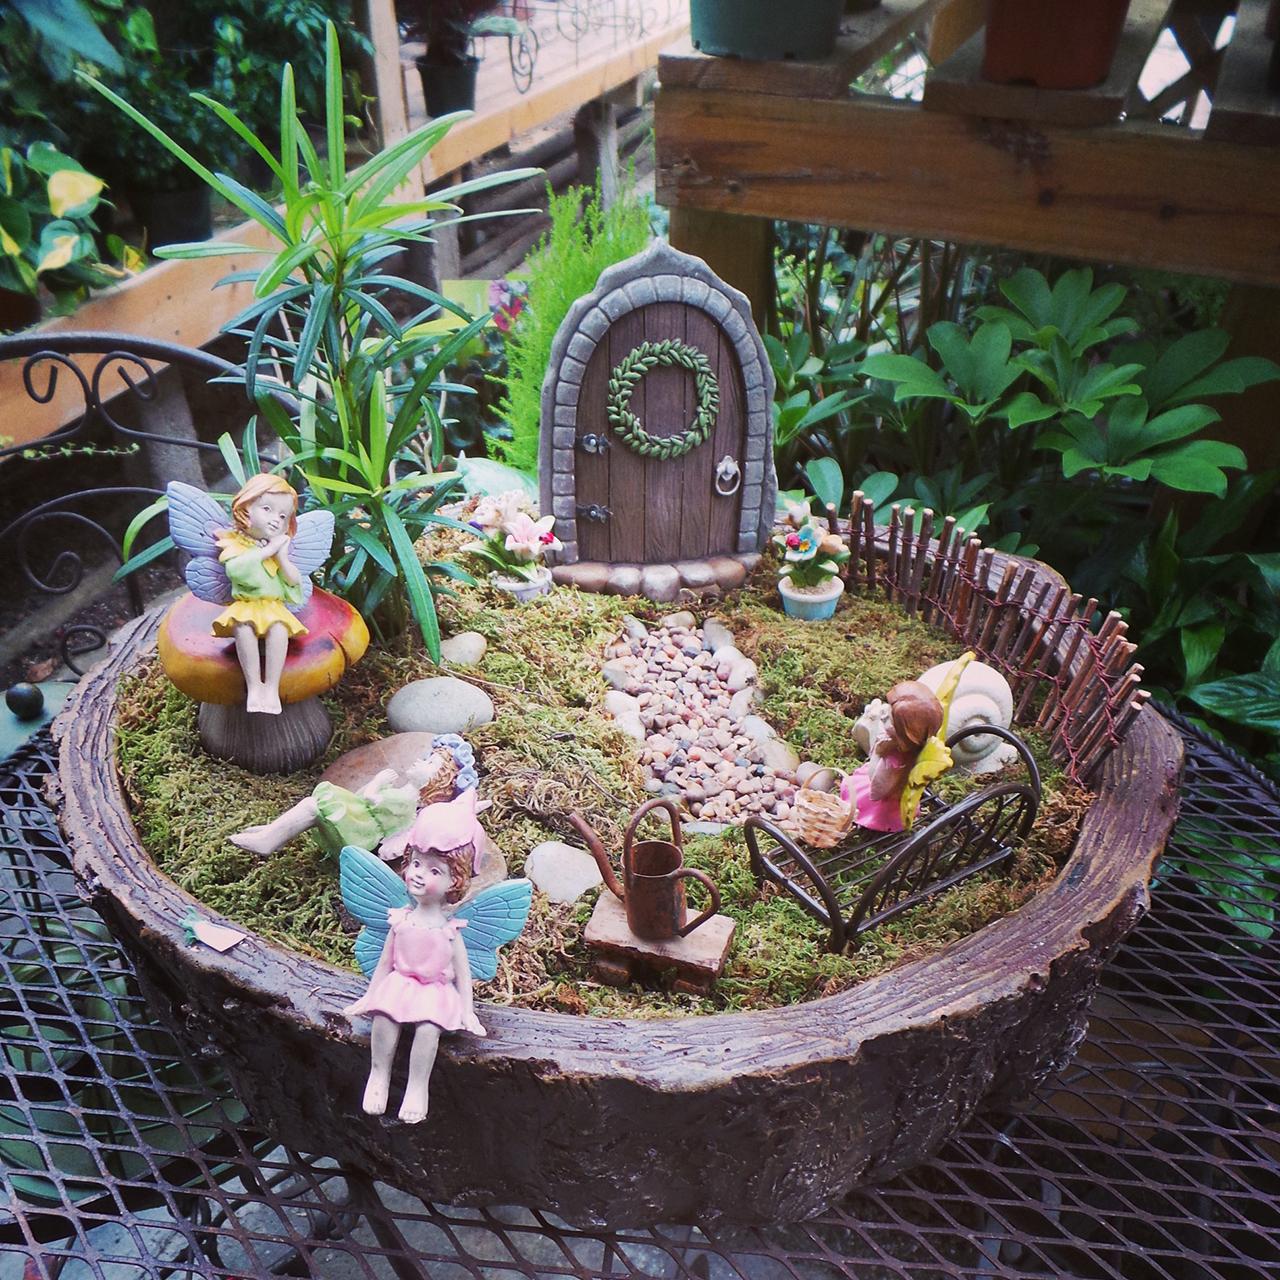 23 Best Diy Backyard Projects And Garden Ideas: The 50 Best DIY Miniature Fairy Garden Ideas In 2019